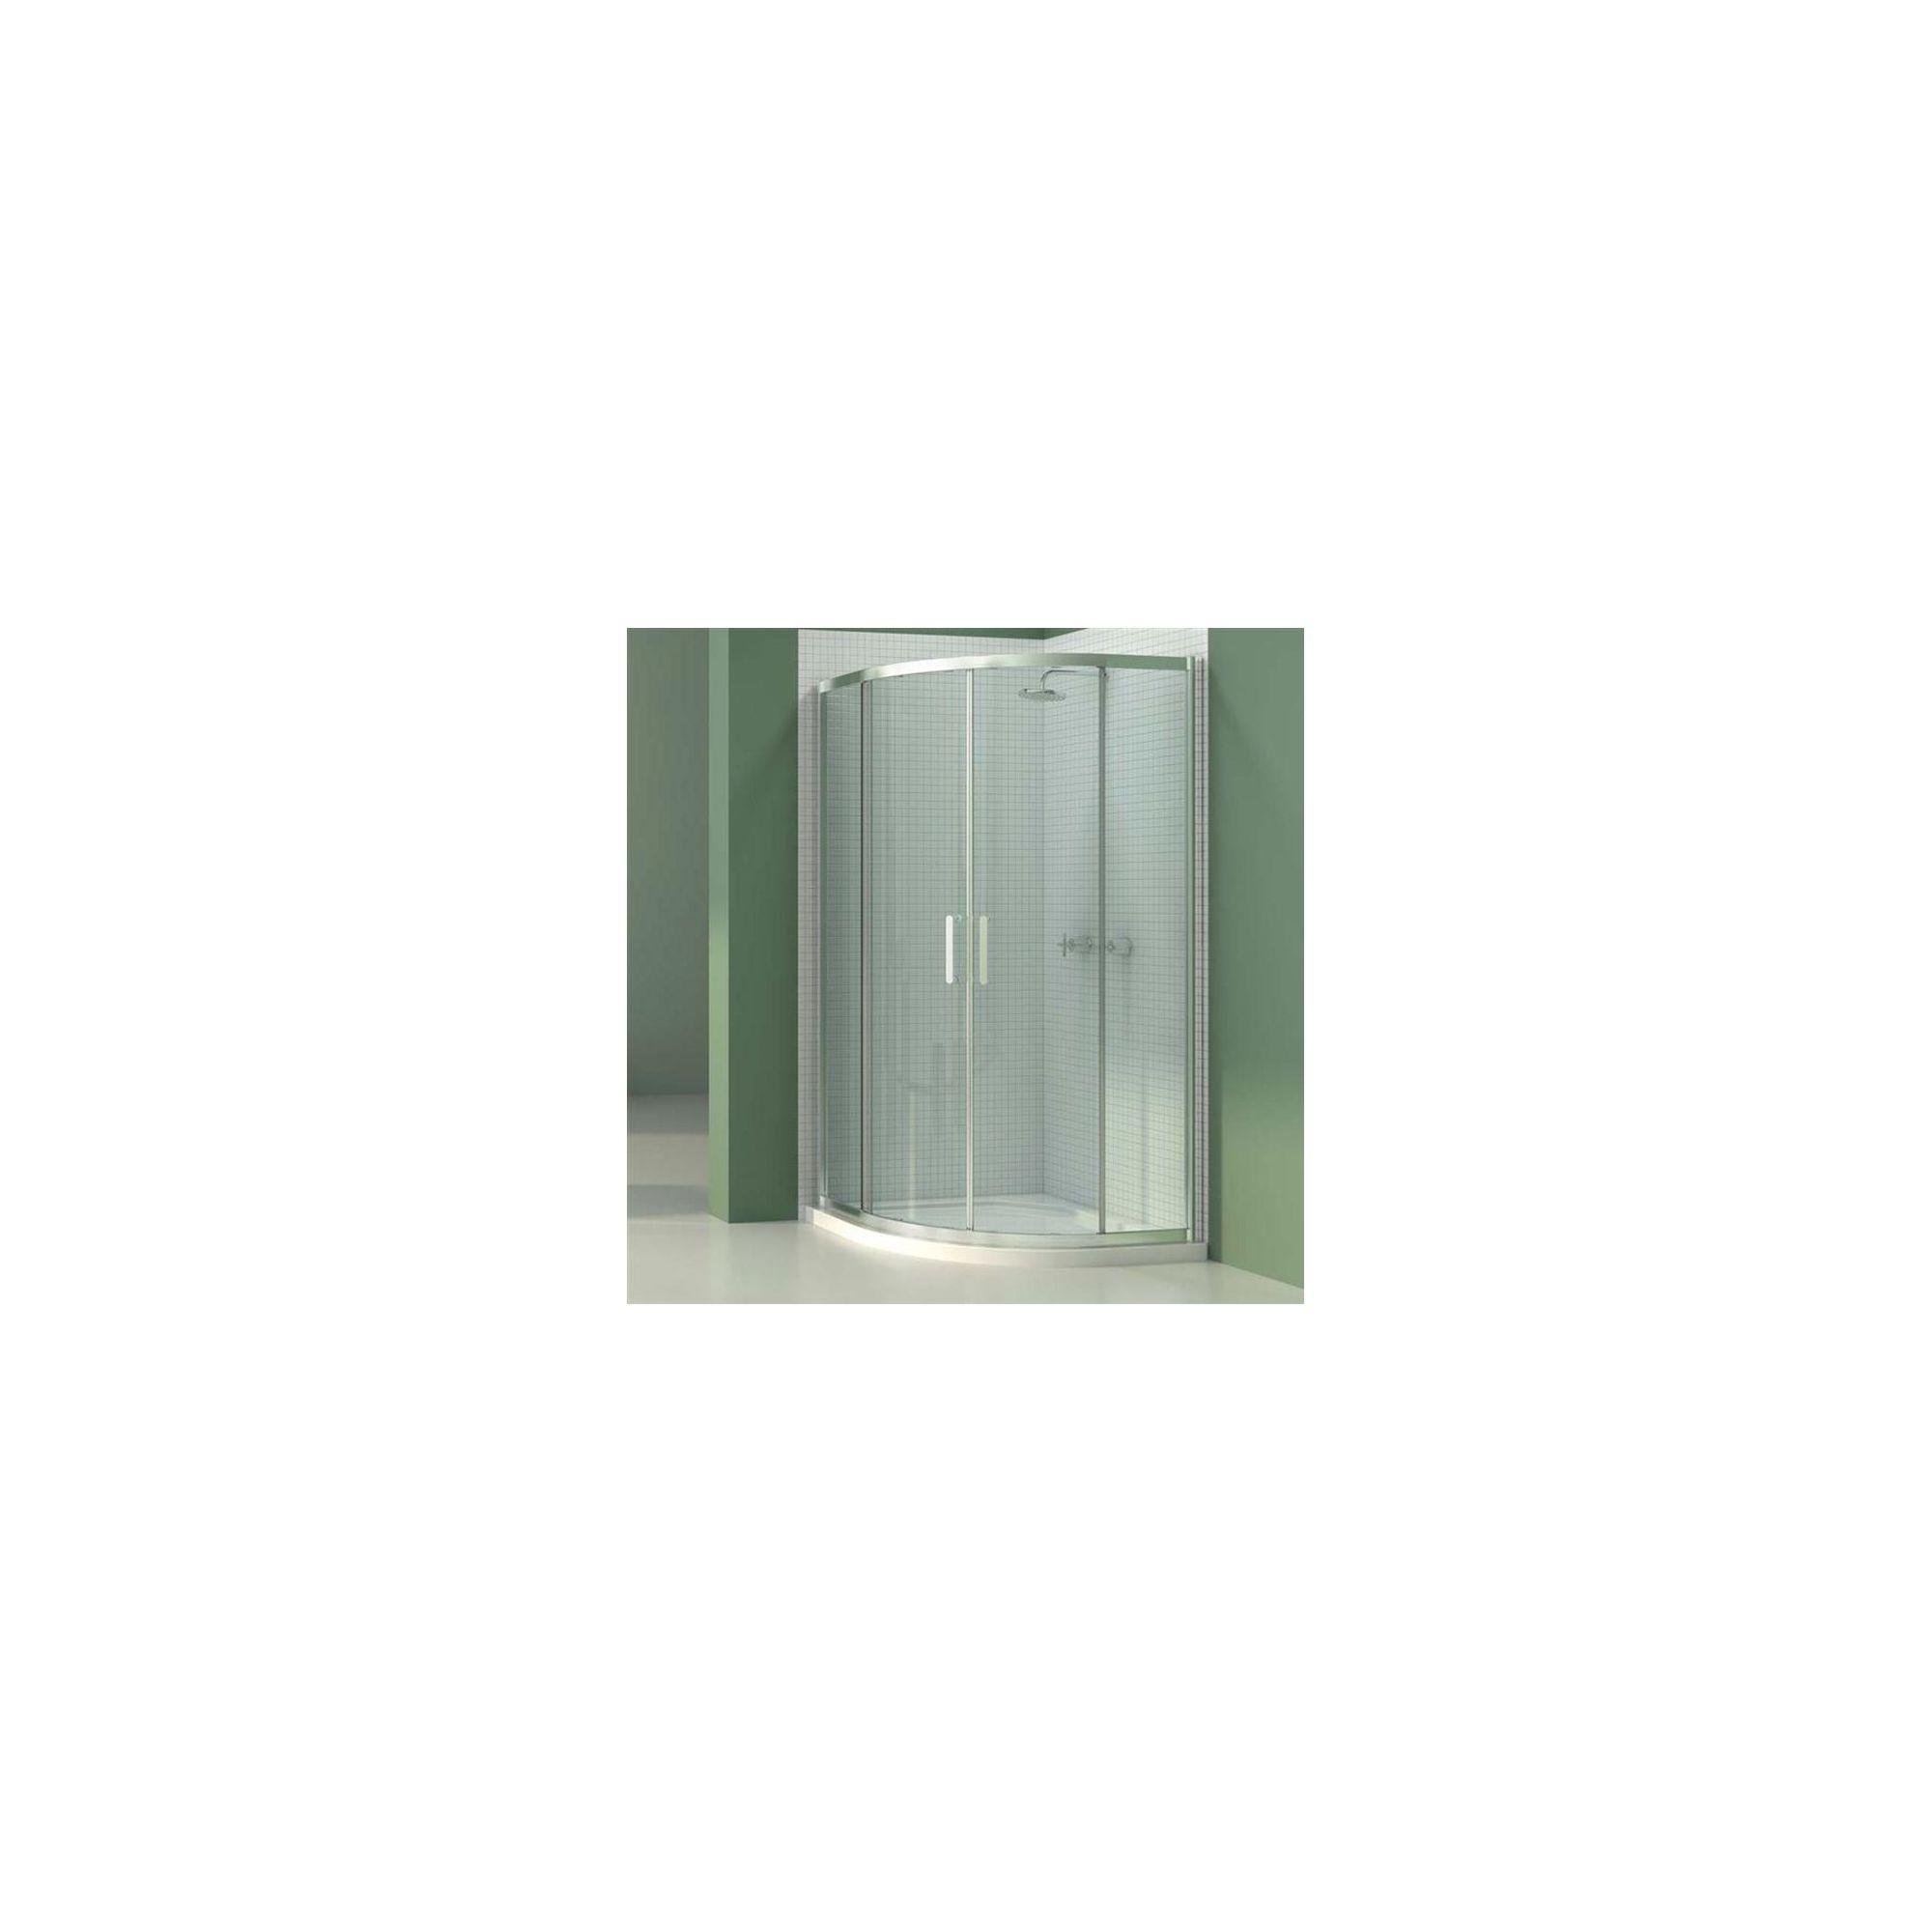 Merlyn Vivid Six Quadrant Shower Door, 800mm x 800mm, 6mm Glass at Tesco Direct